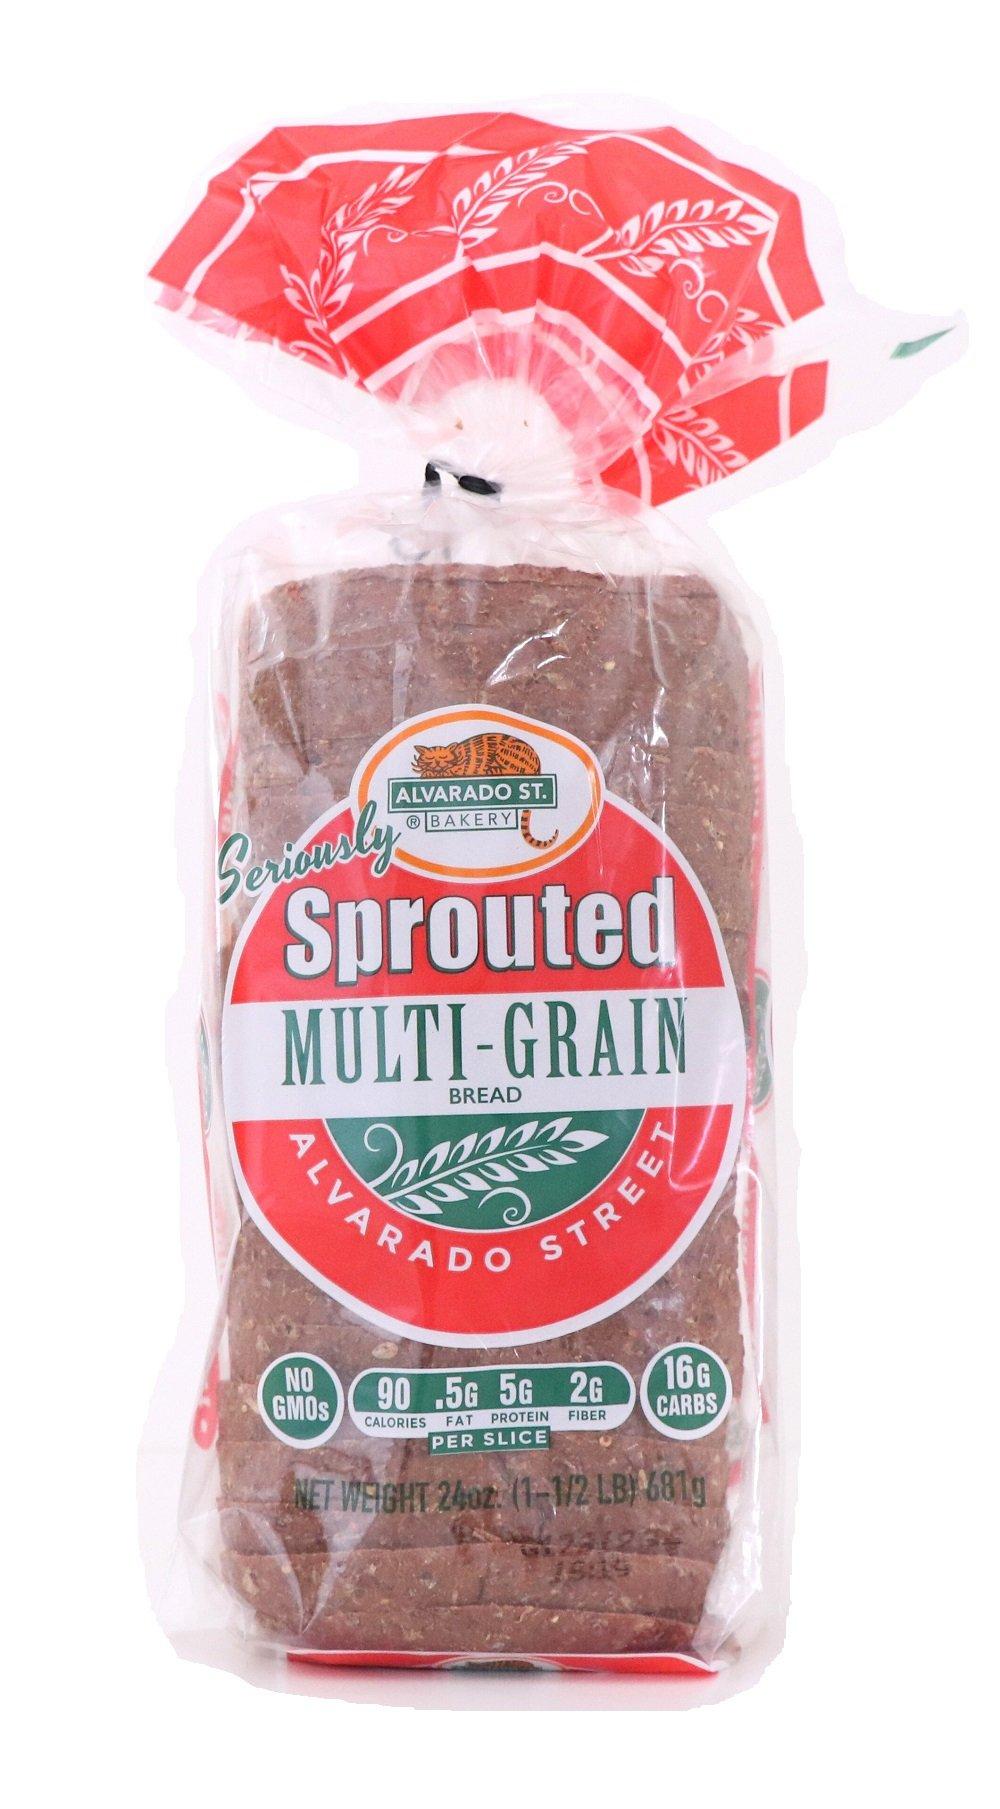 Alvarado Street Bakery Organic Sprouted Wheat Multi-Grain Bread, 24 Ounce - 6 per case.